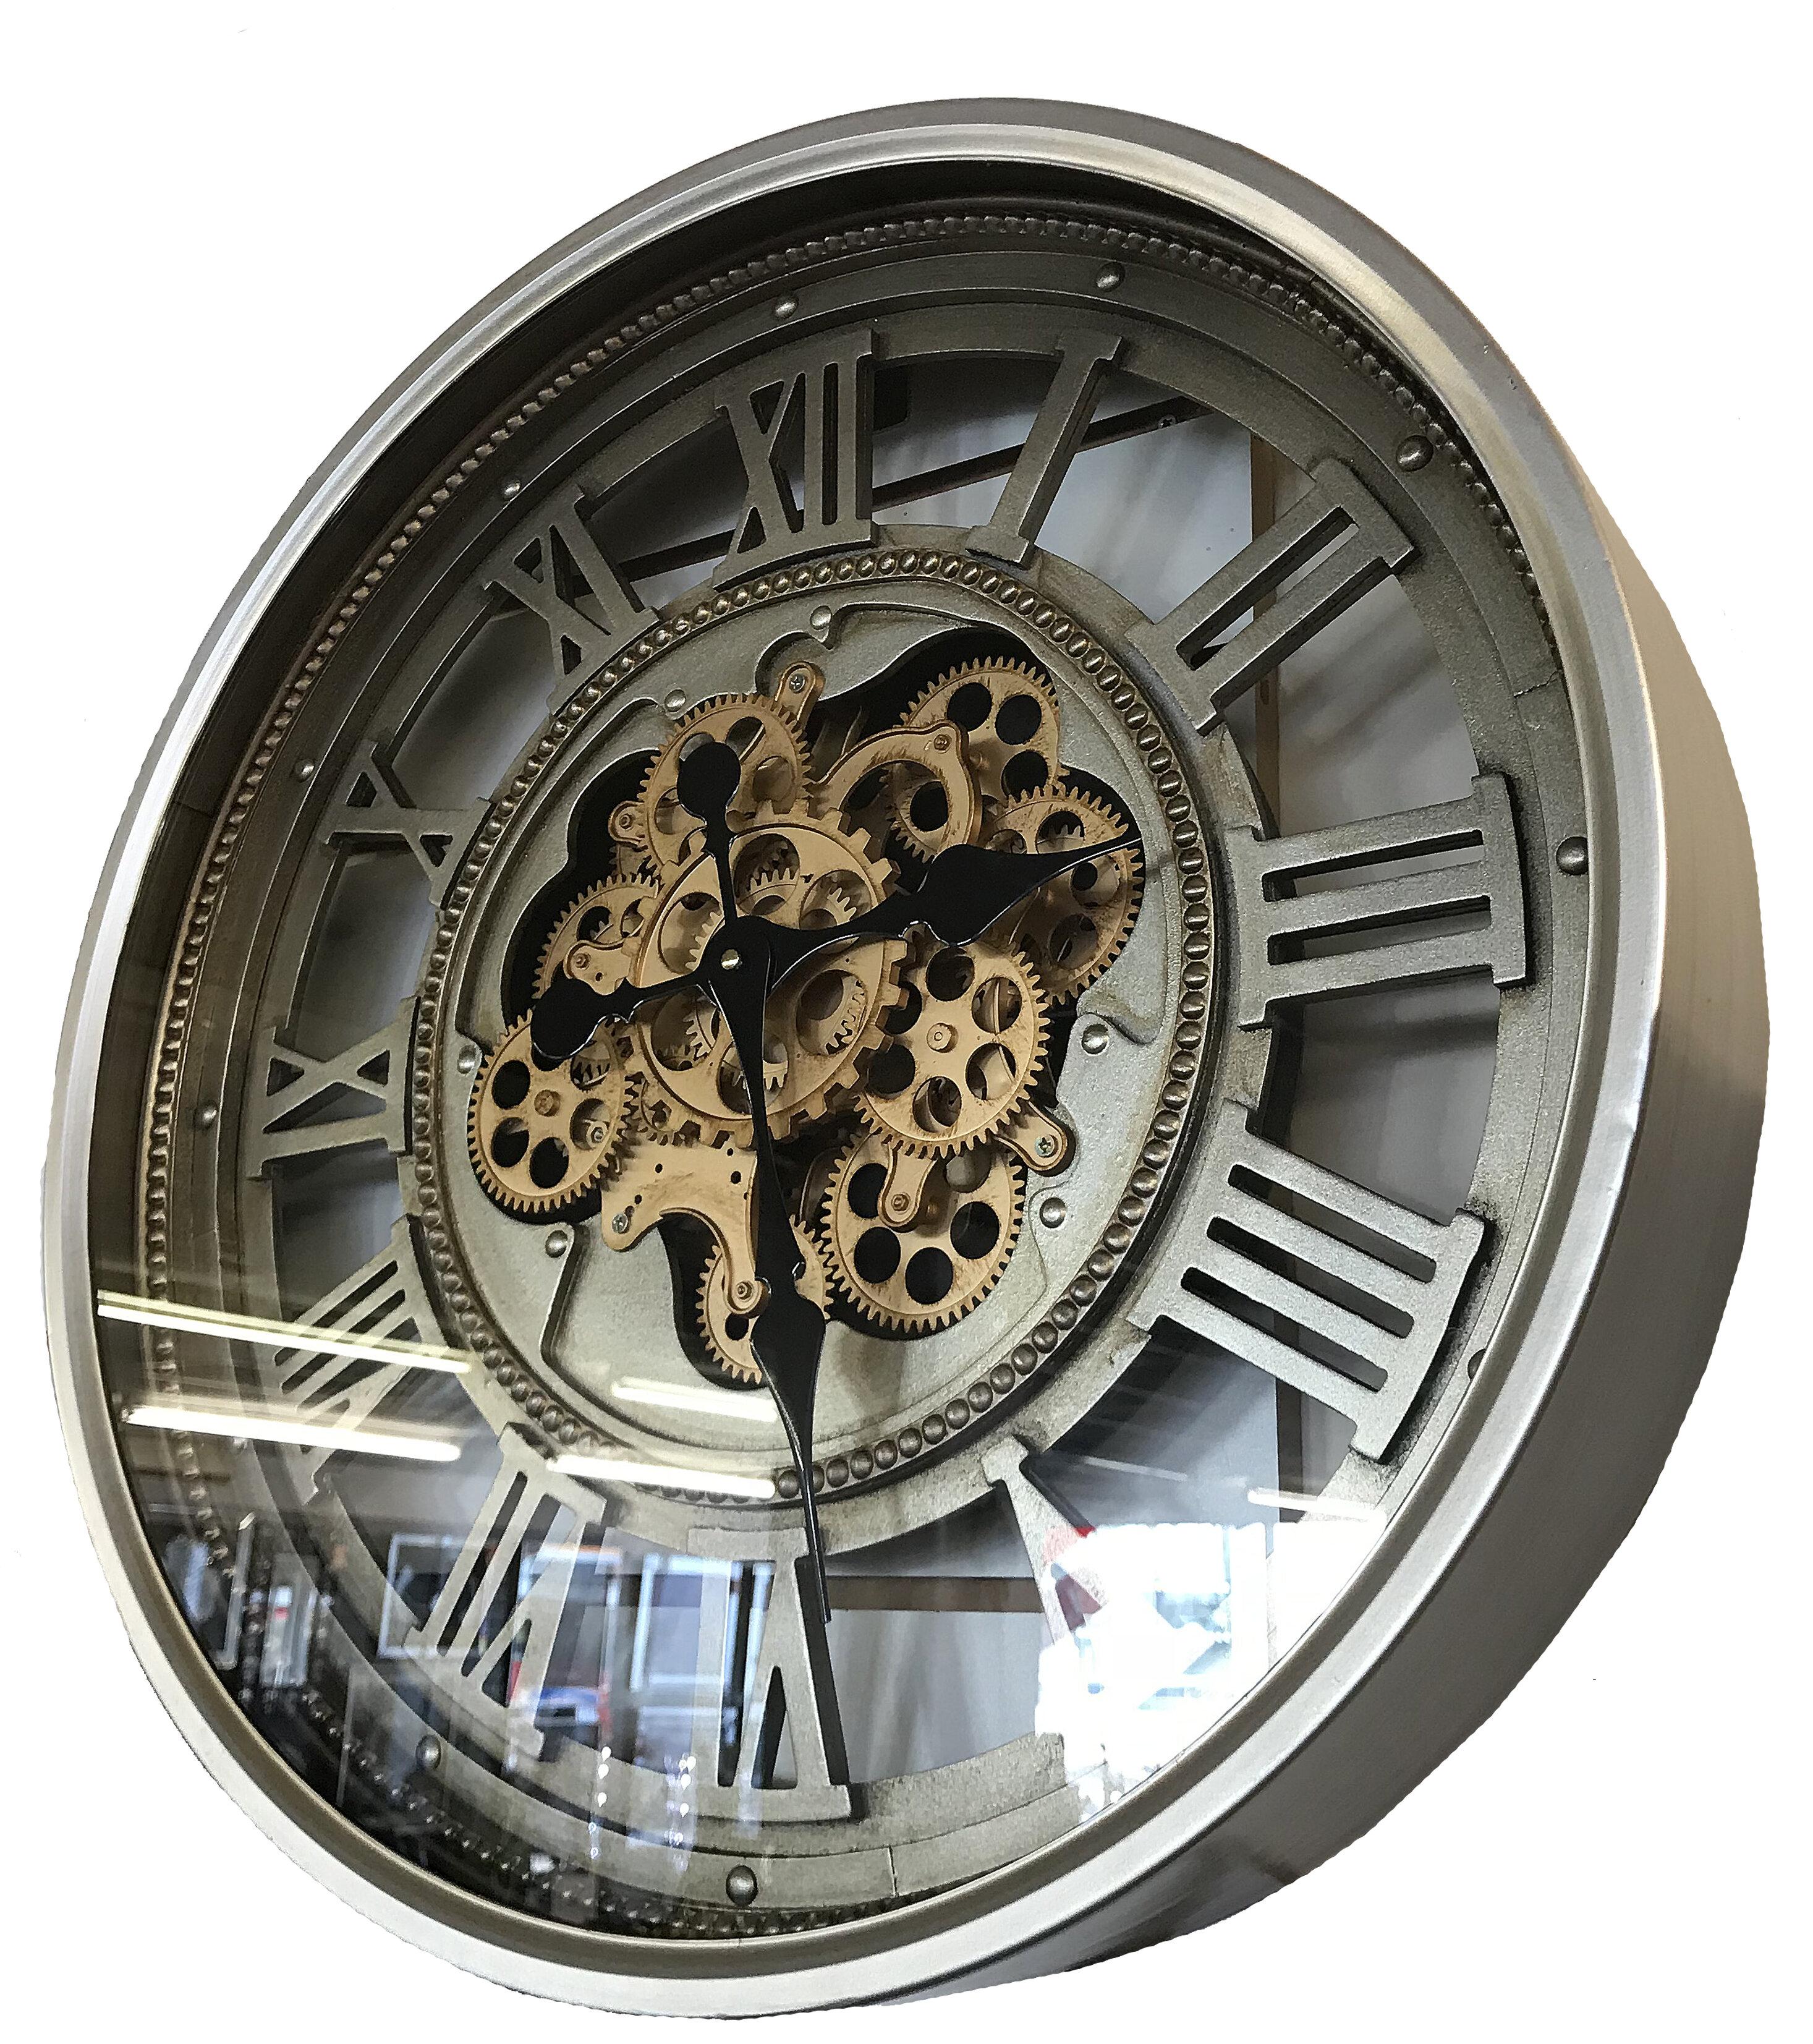 Attractive Laurel Foundry Martingale Vintage Retro Aged Mechanical Moving Gear  Skeleton 60cm Wall Clock U0026 Reviews | Wayfair.co.uk